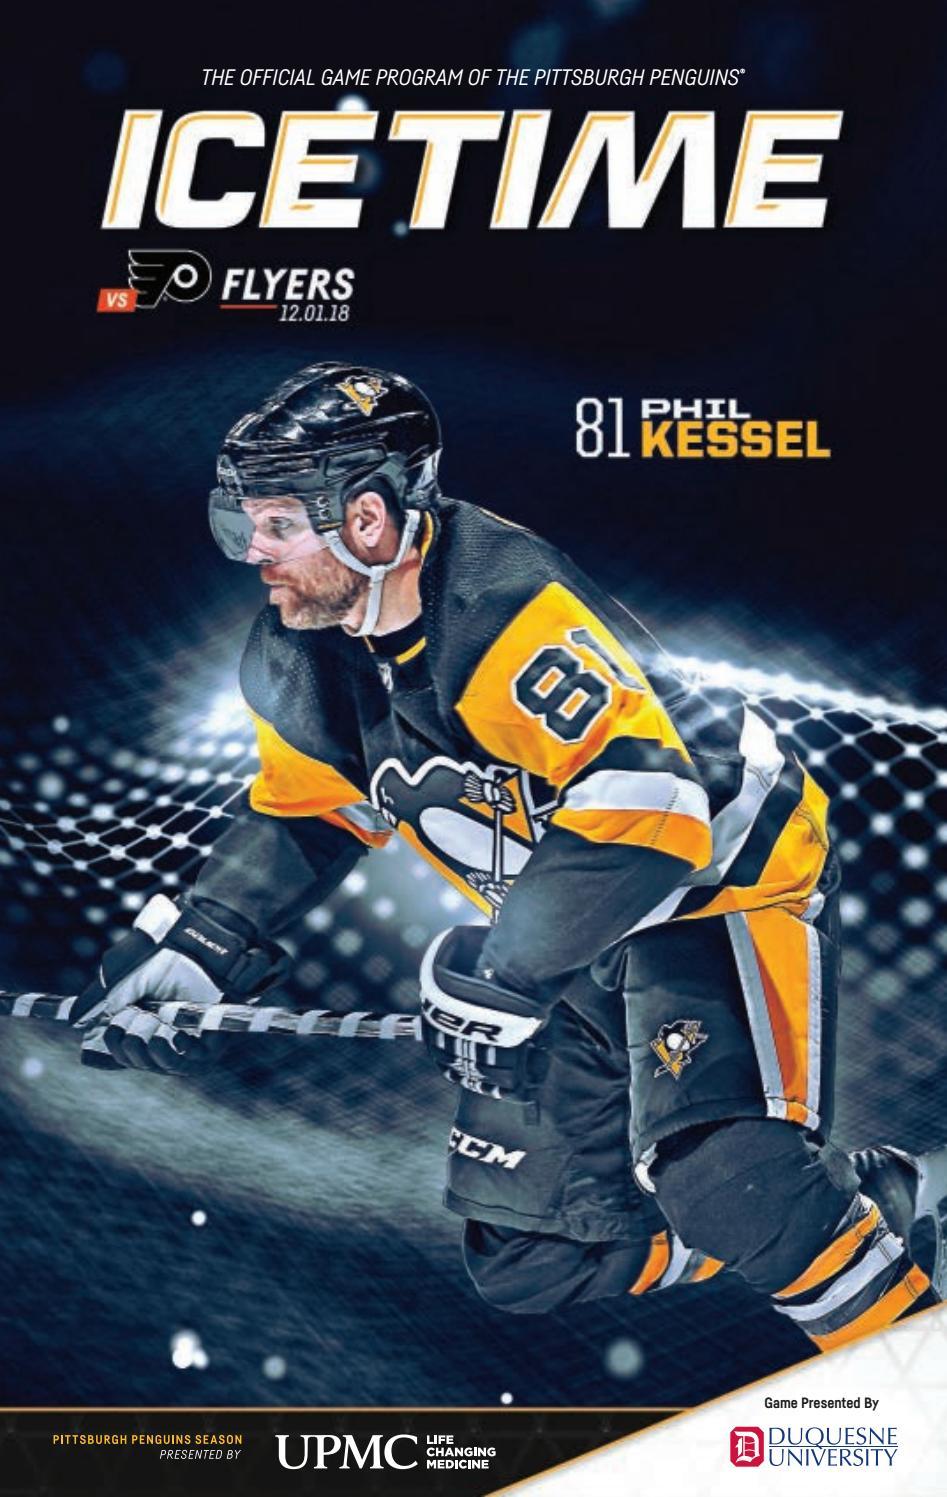 c2608764 IceTime - Game 13 vs. Philadelphia Flyers 12.01.18 by Pittsburgh ...